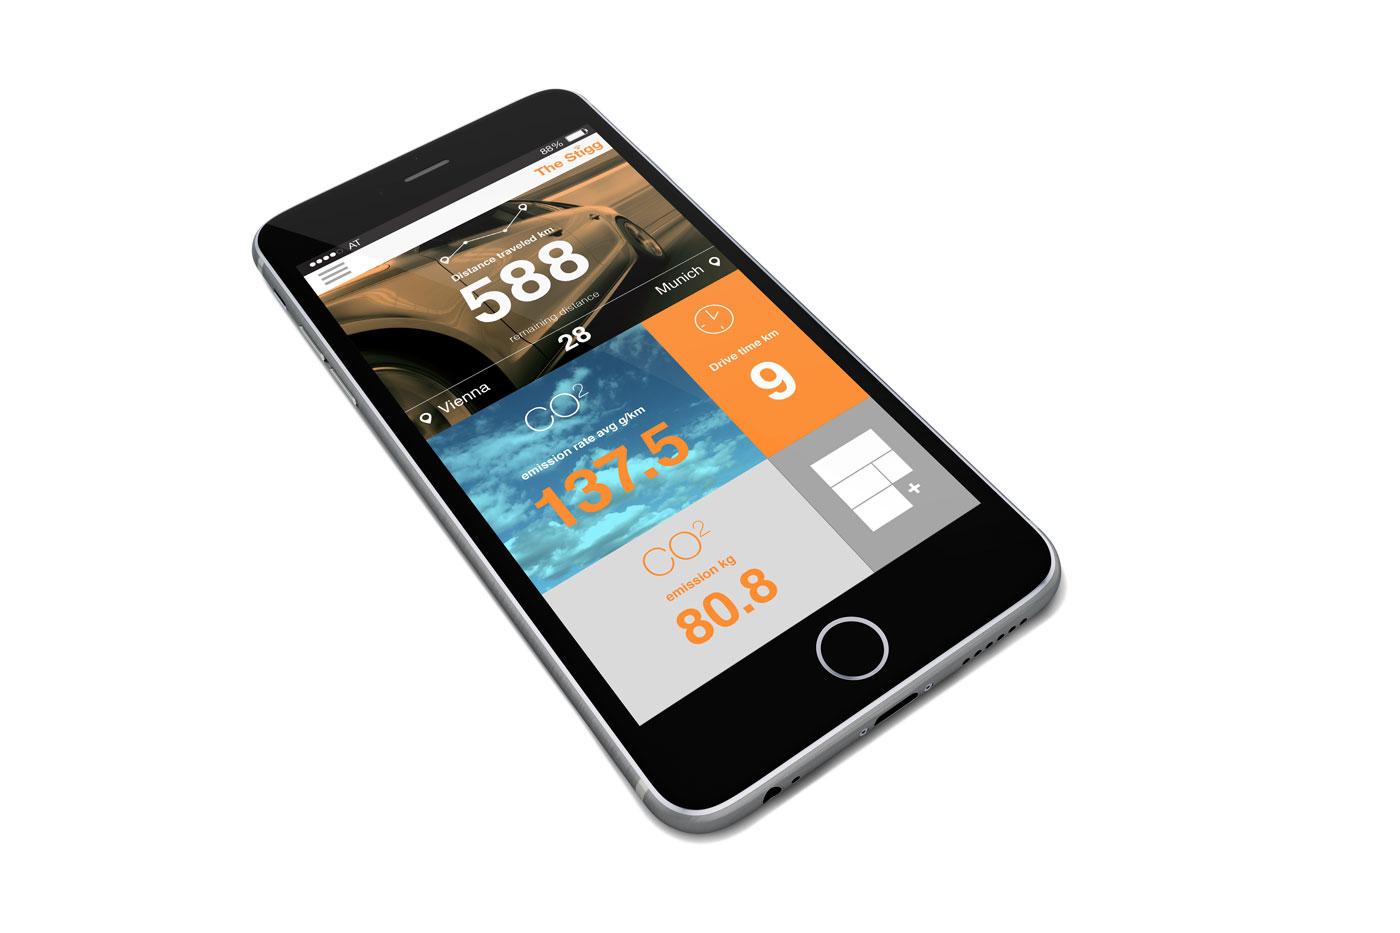 smarte-apps-6_the-stigg_designkitchen.jpg